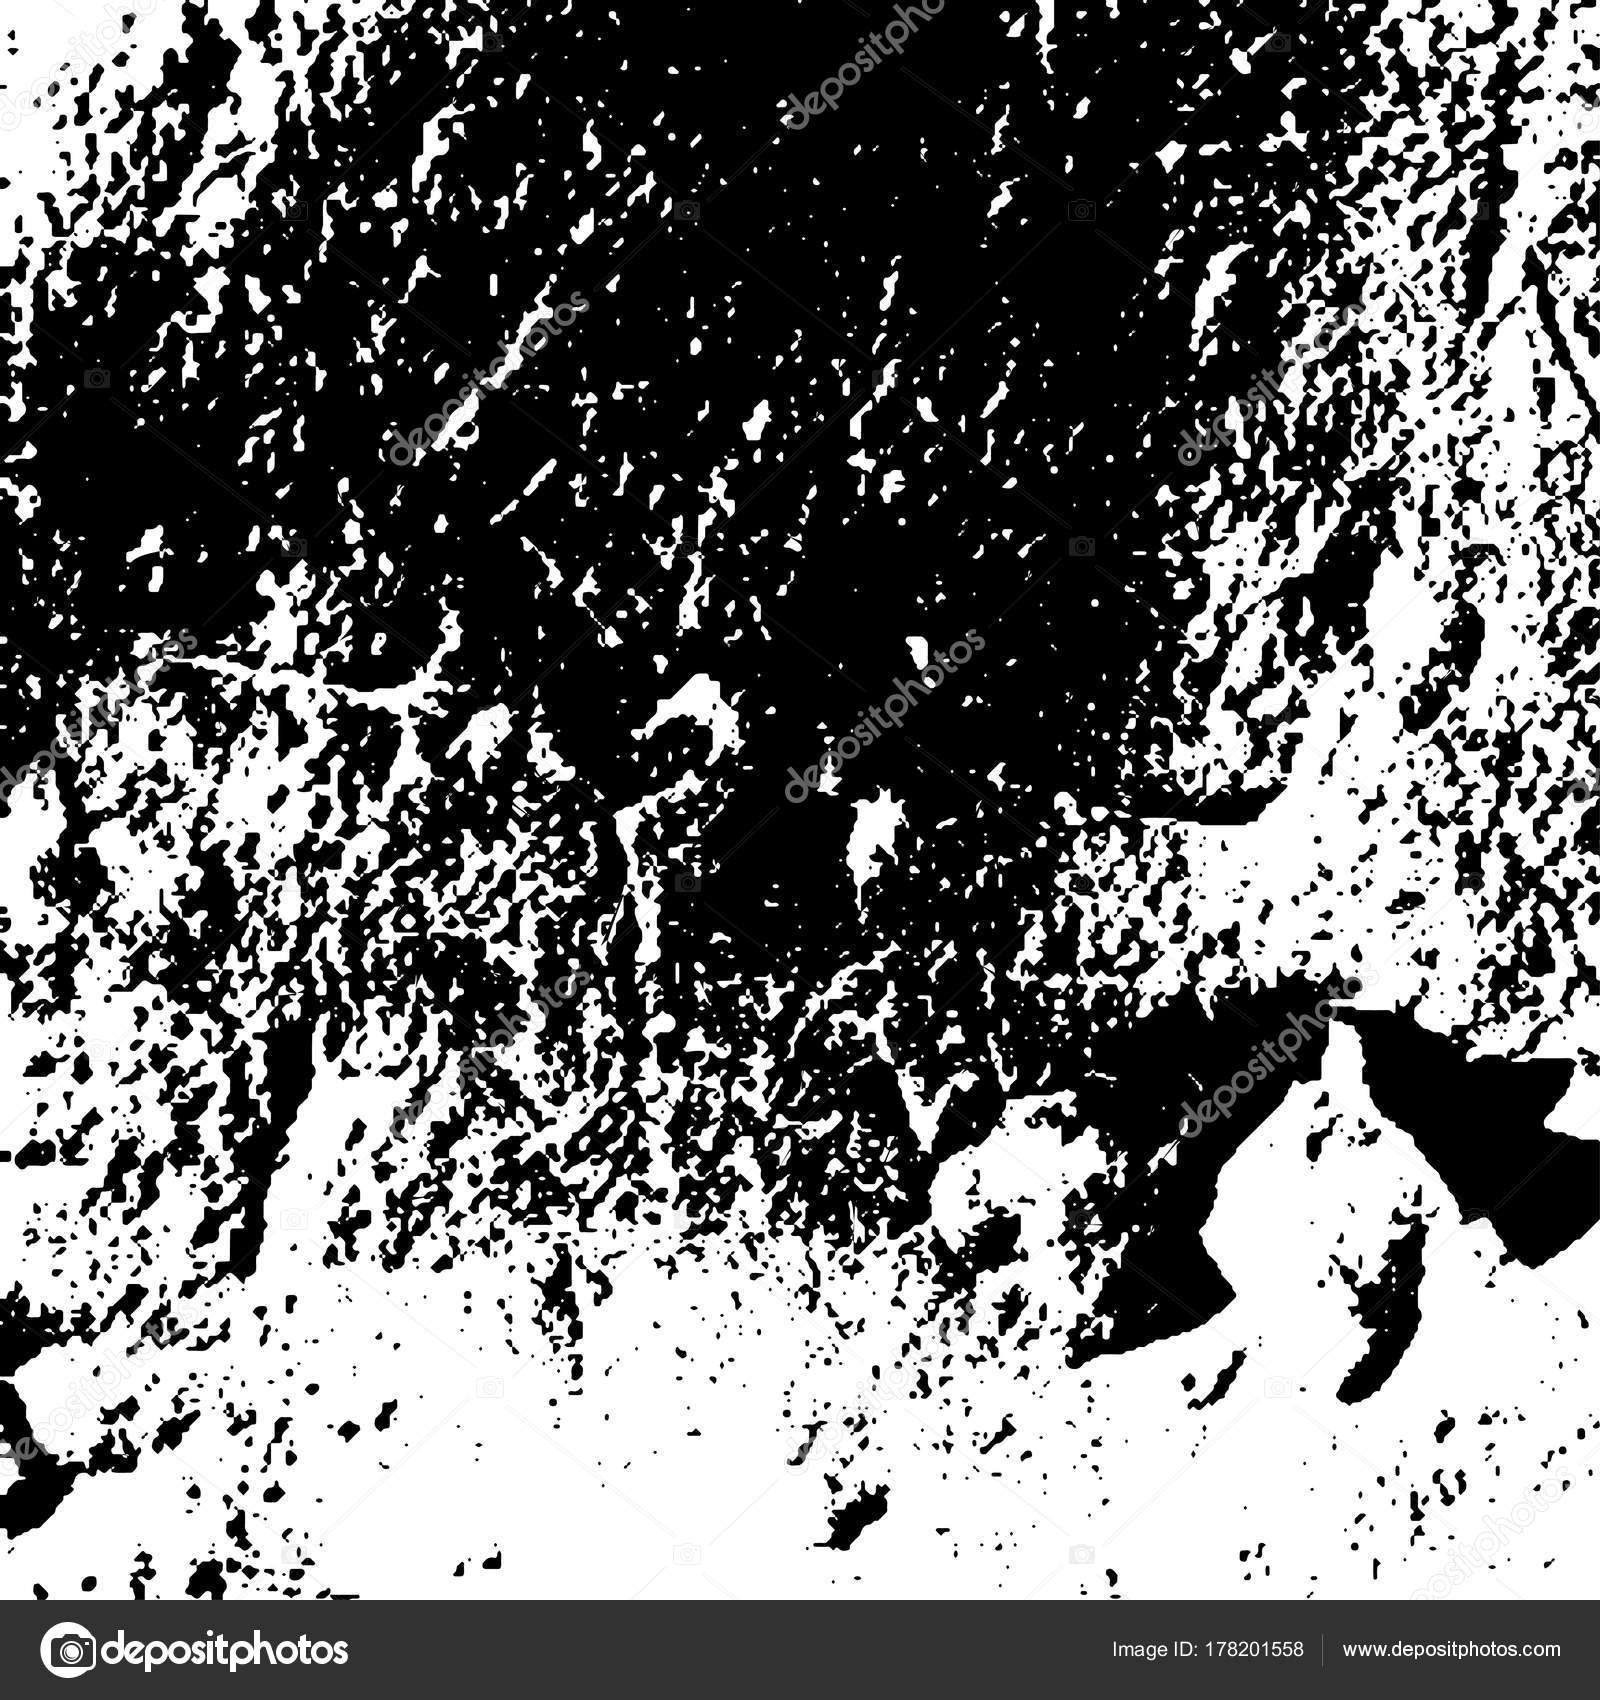 Grunge black textures on white background template for business grunge black textures on white background template for business card banner poster colourmoves